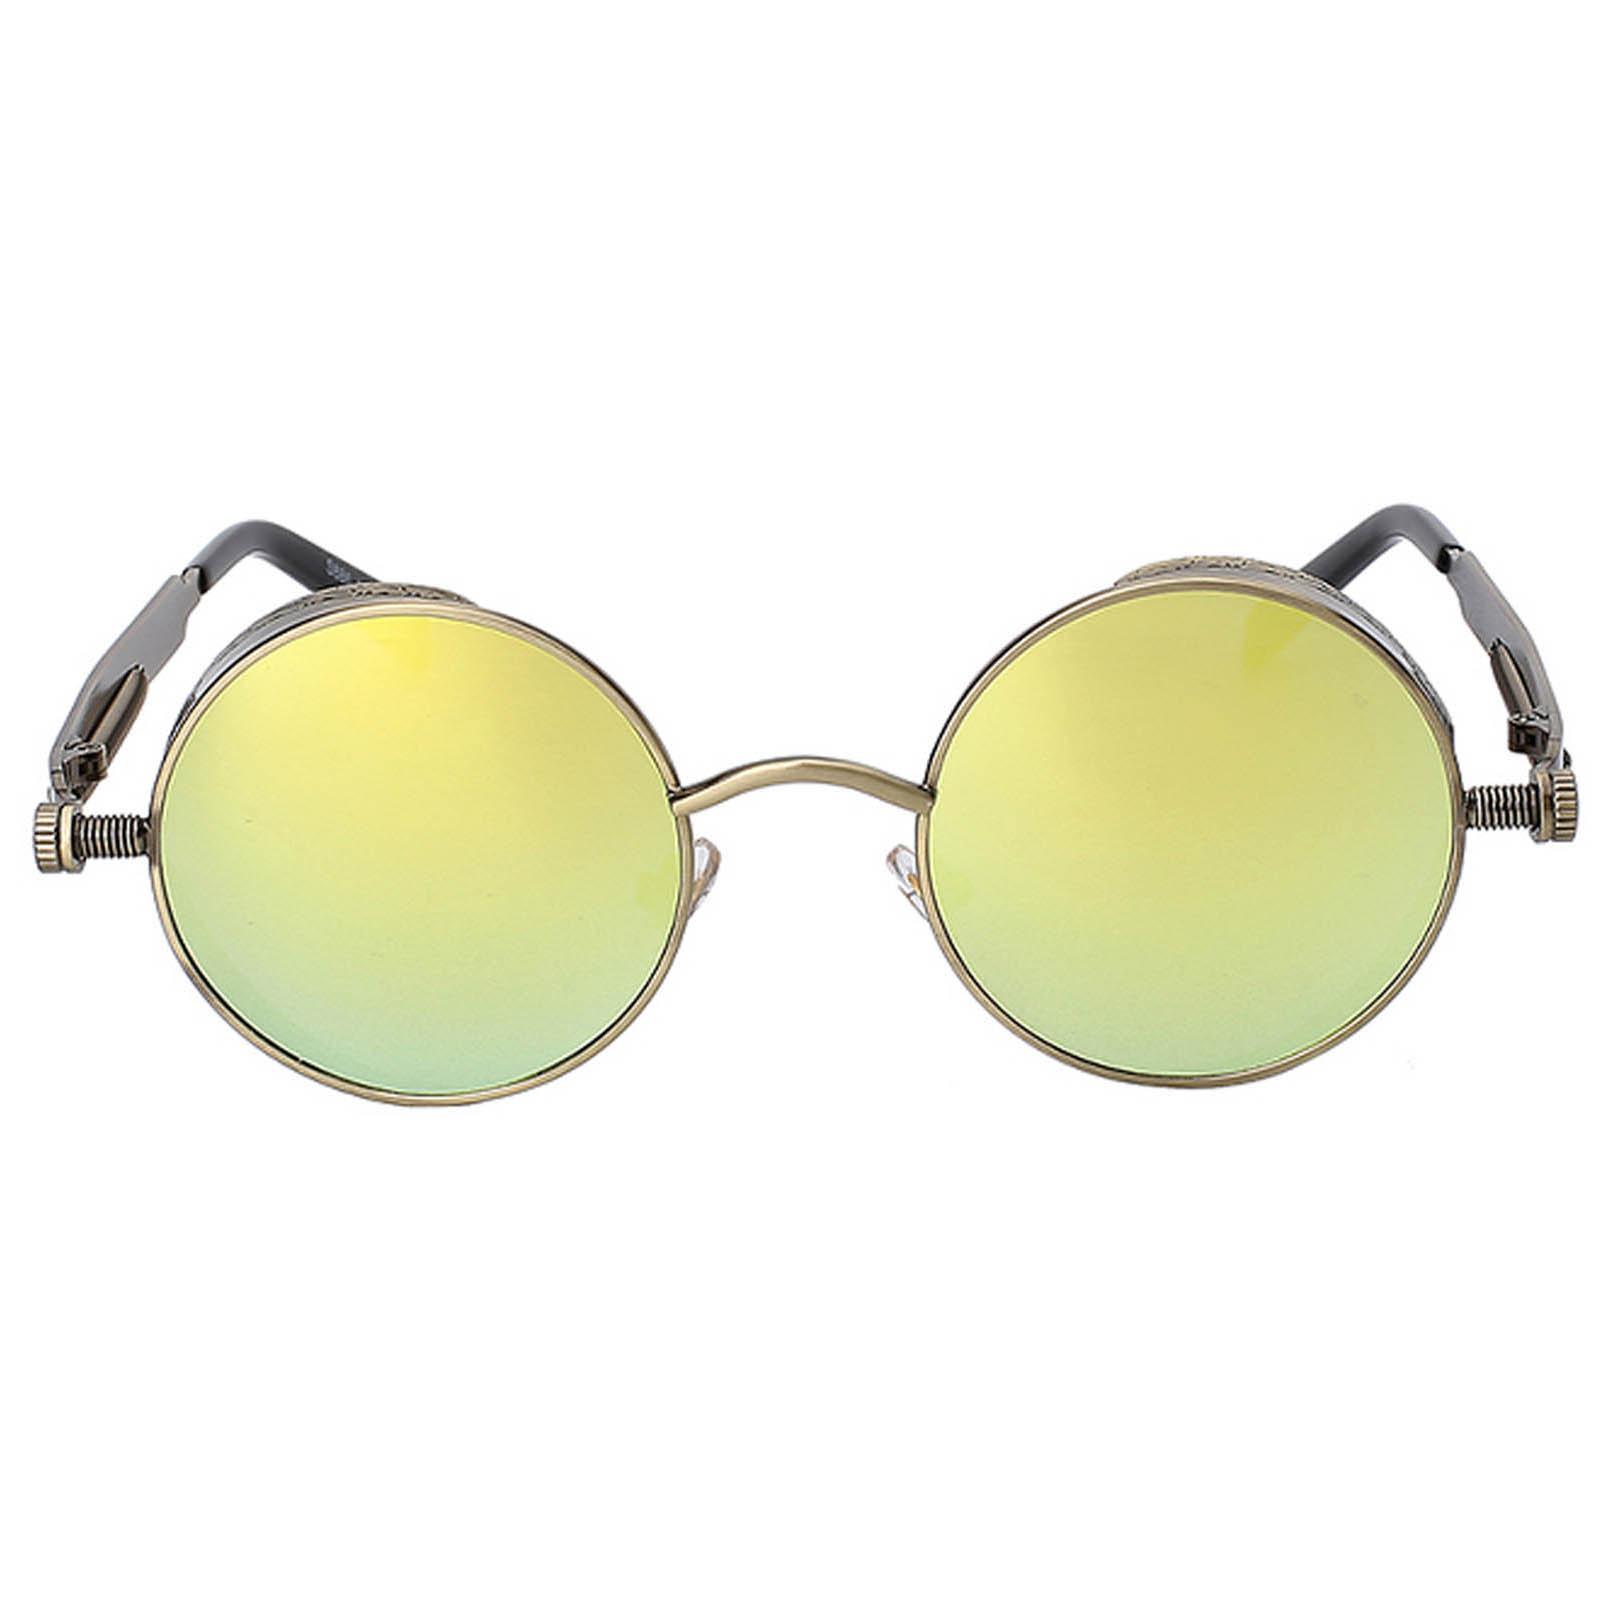 dbb848d92f2 OWL ® Steampunk C5 Gothic Eyewear Sunglasses Women s Men s Metal Round  Circle Anti Brass Frame Gold